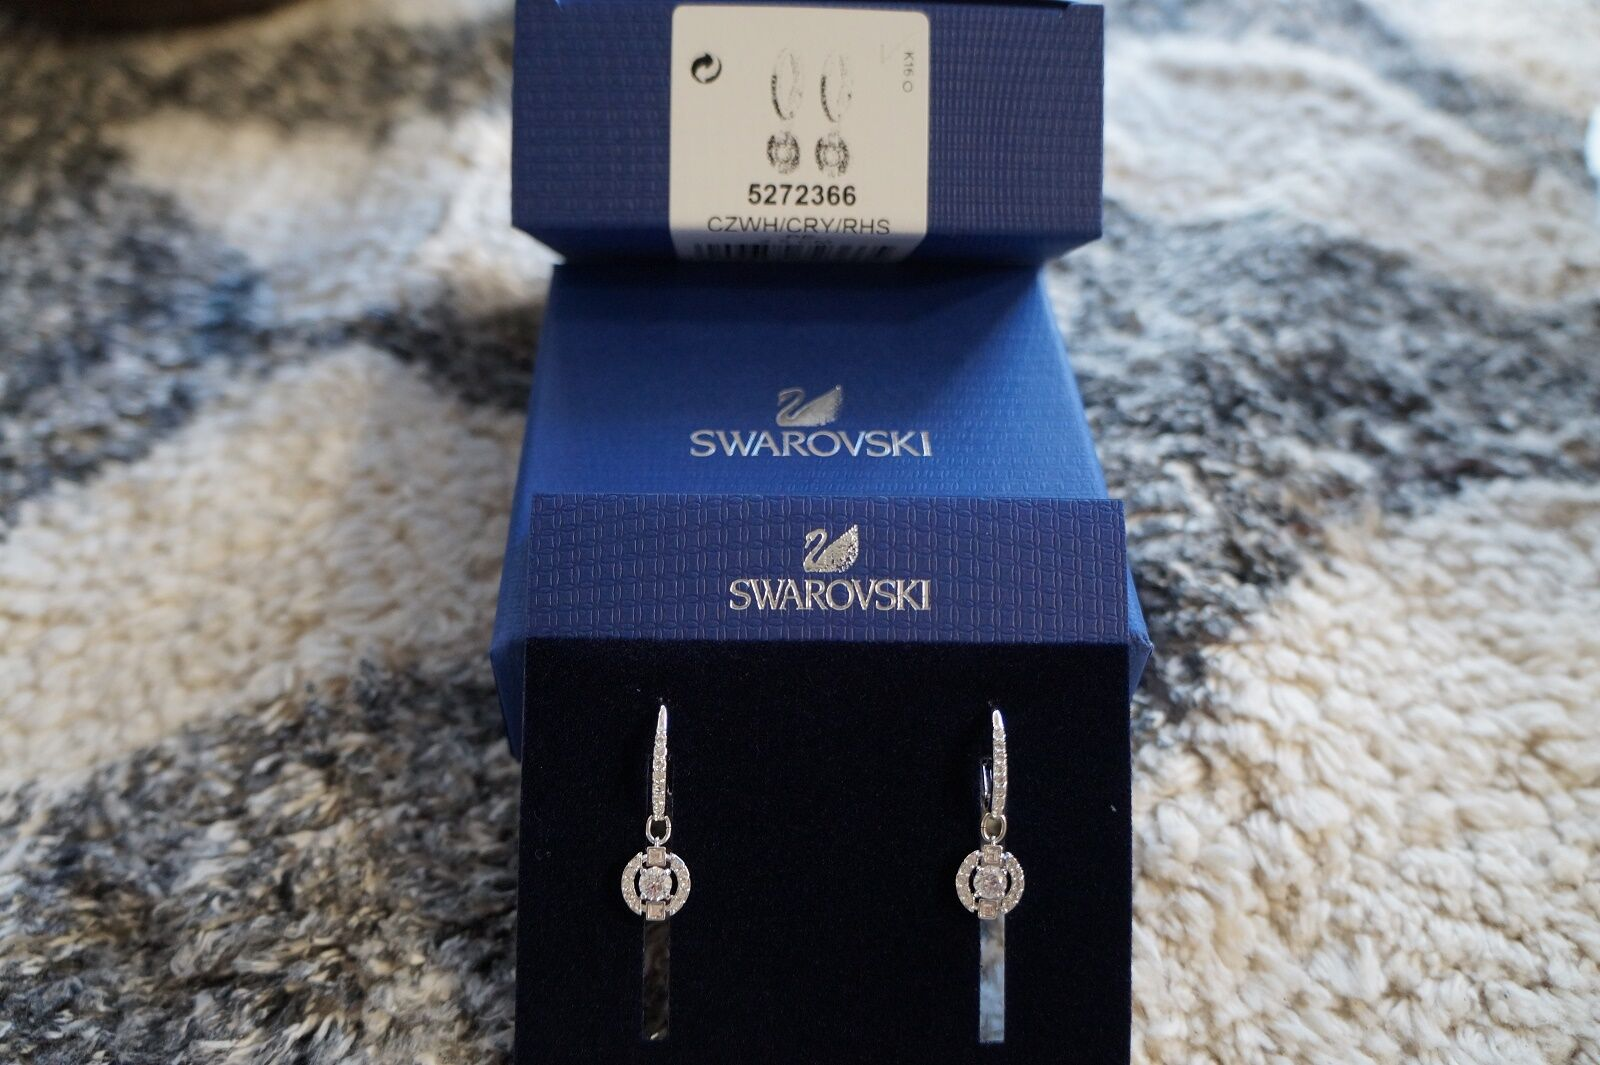 Swarovski 5272366 Sparkling Pierced Earrings NIB 100% Authentic